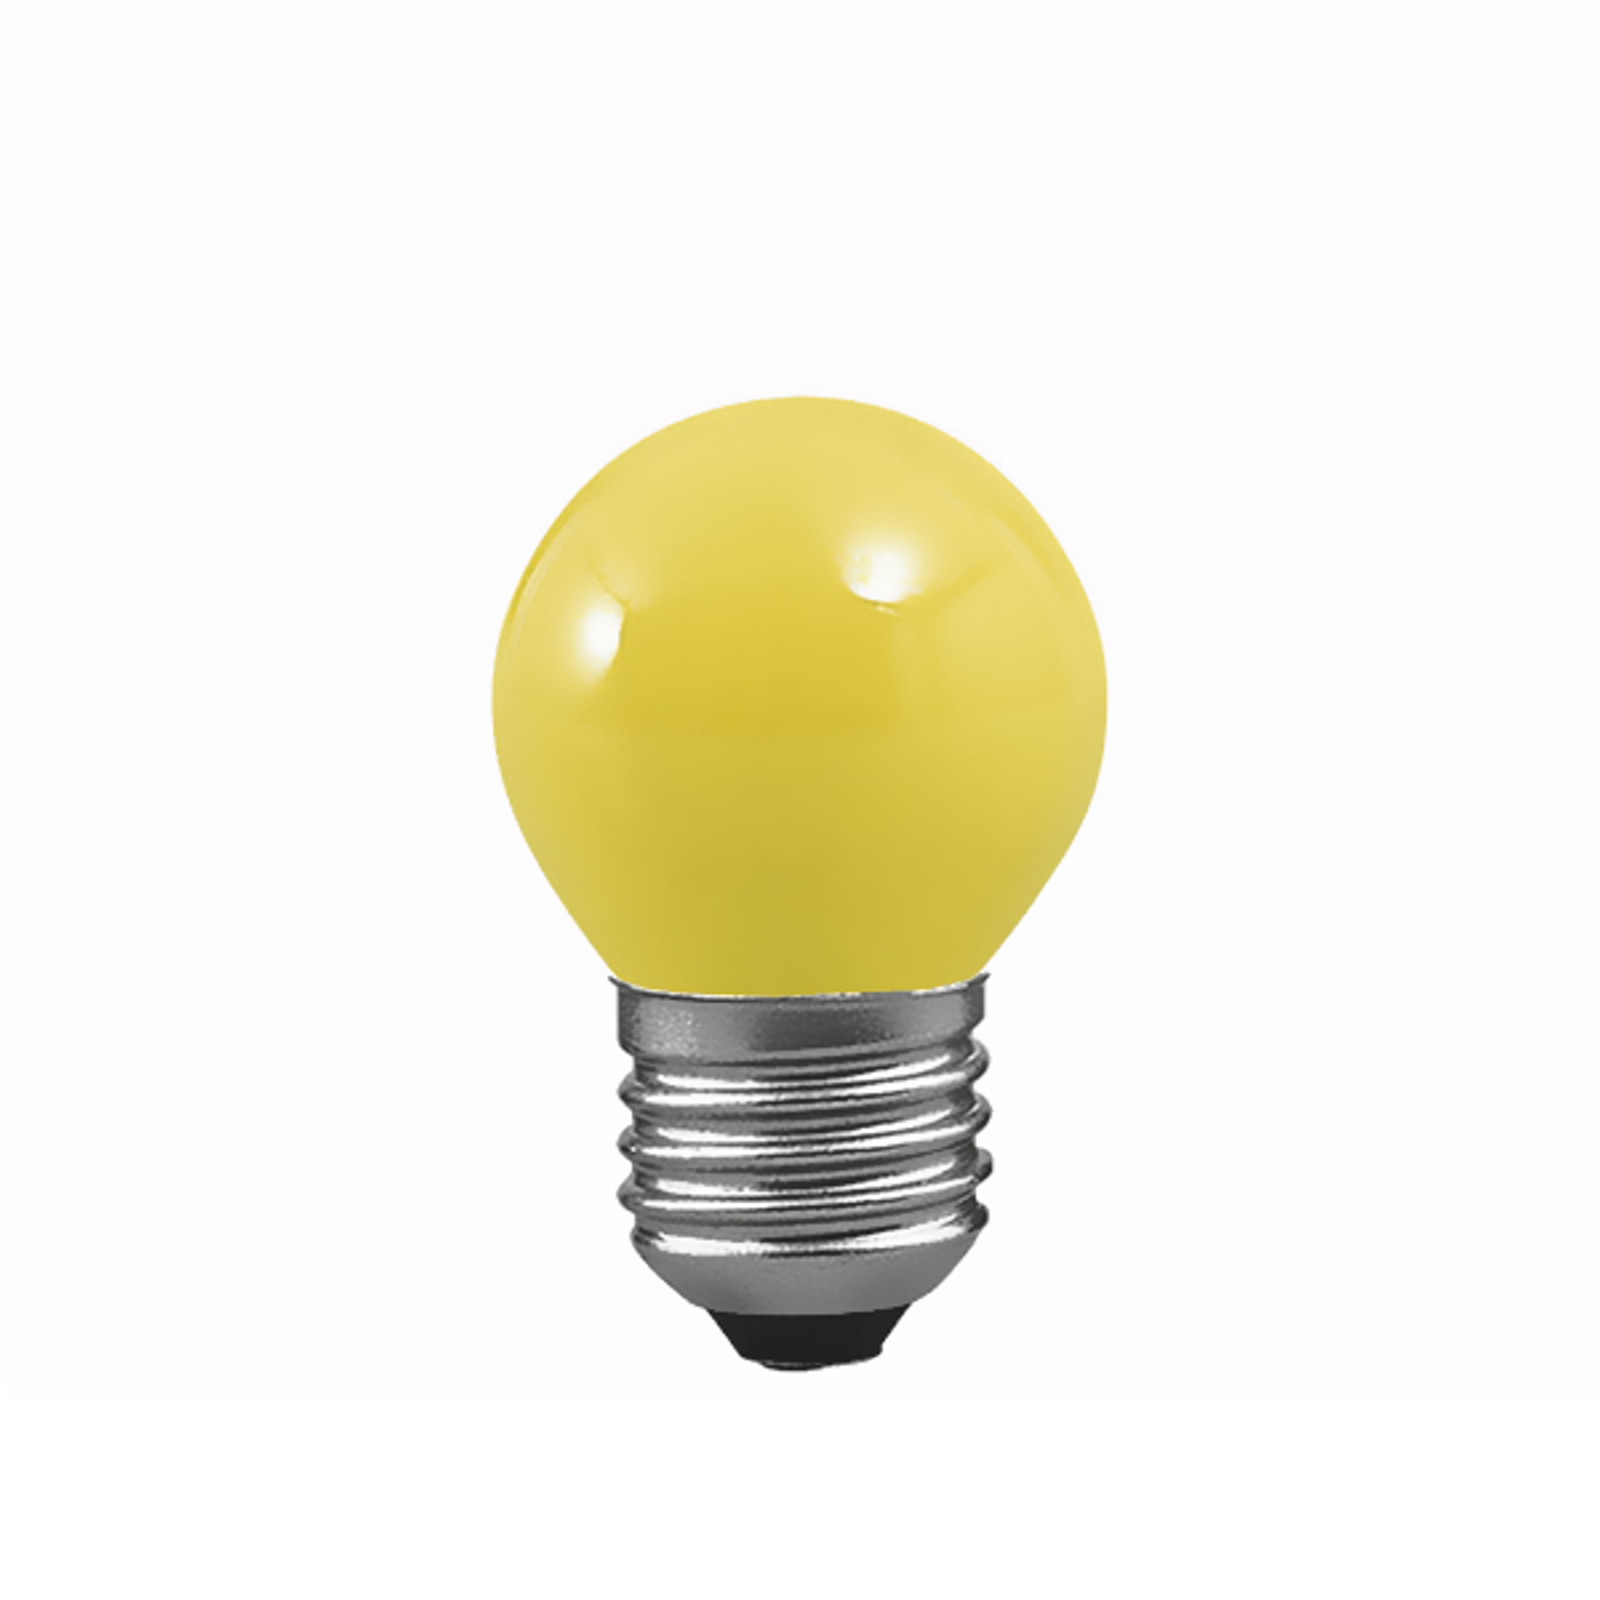 Paulmann E27 Tropfenlampe 25W, f.Lichterkette gelb